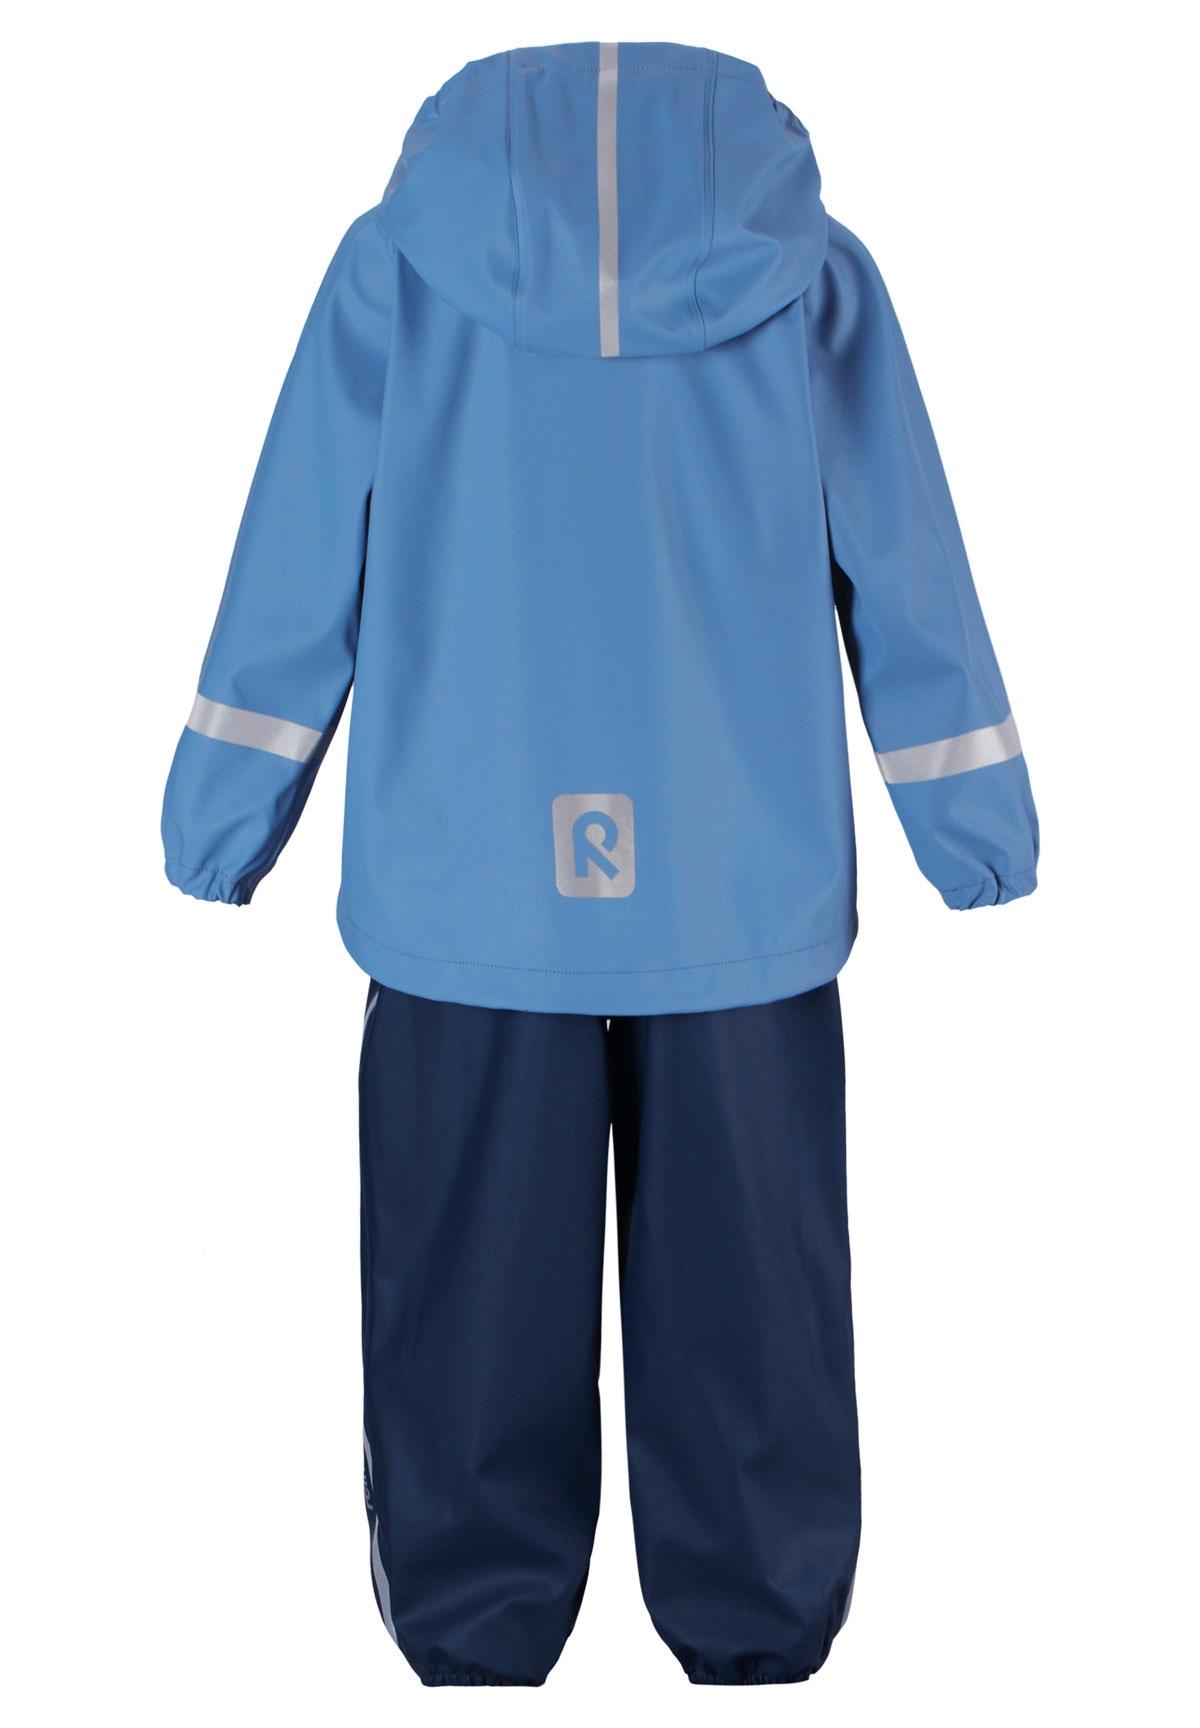 7b4fa14c Reima Tihku Regnsett til barn, denim blå - DressMyKid AS